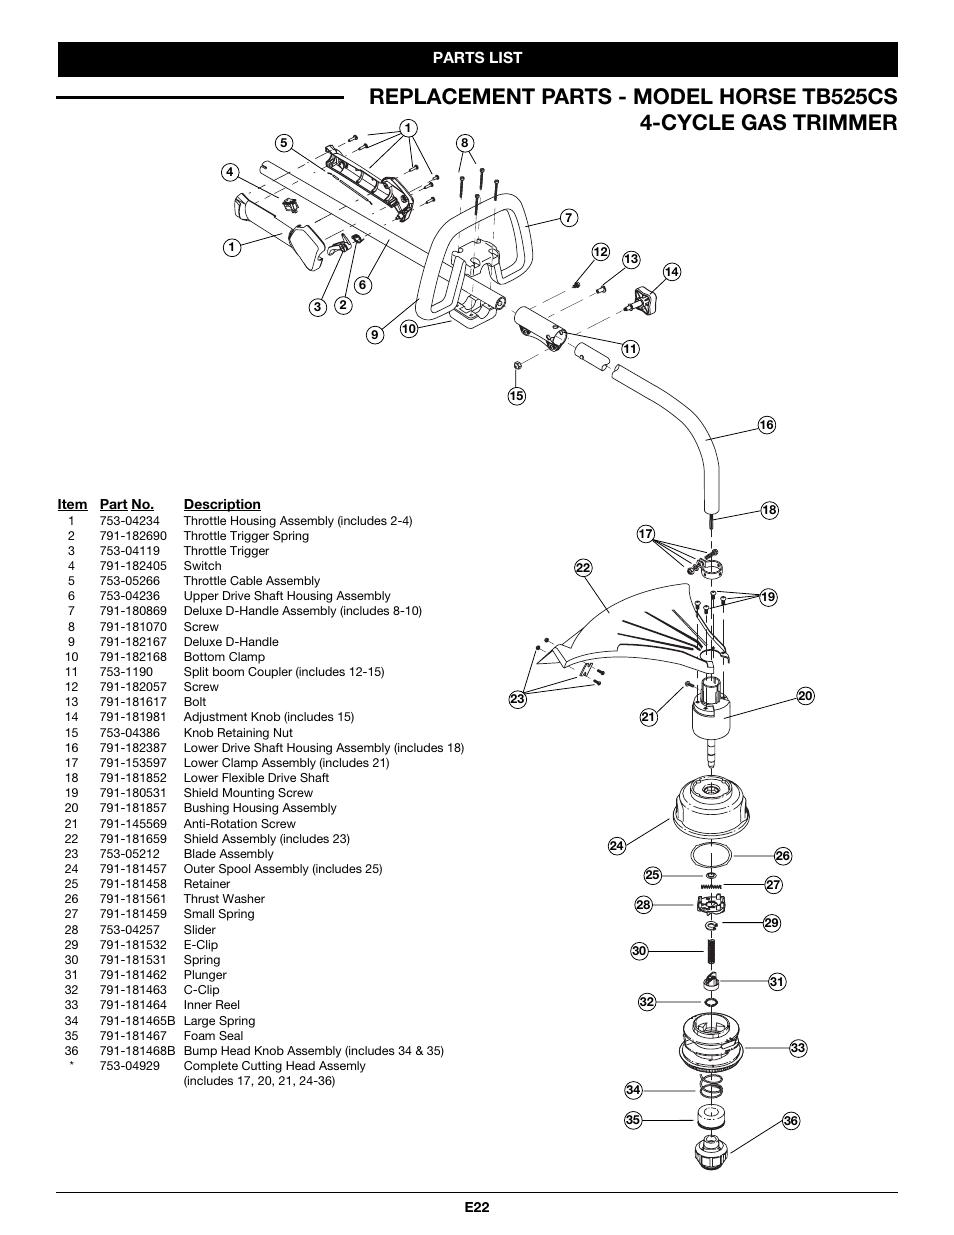 Troy Bilt Tb 525 Cs Parts Diagram Electrical Wiring Diagrams Older Model Tiller Tb525cs User Manual Page 62 64